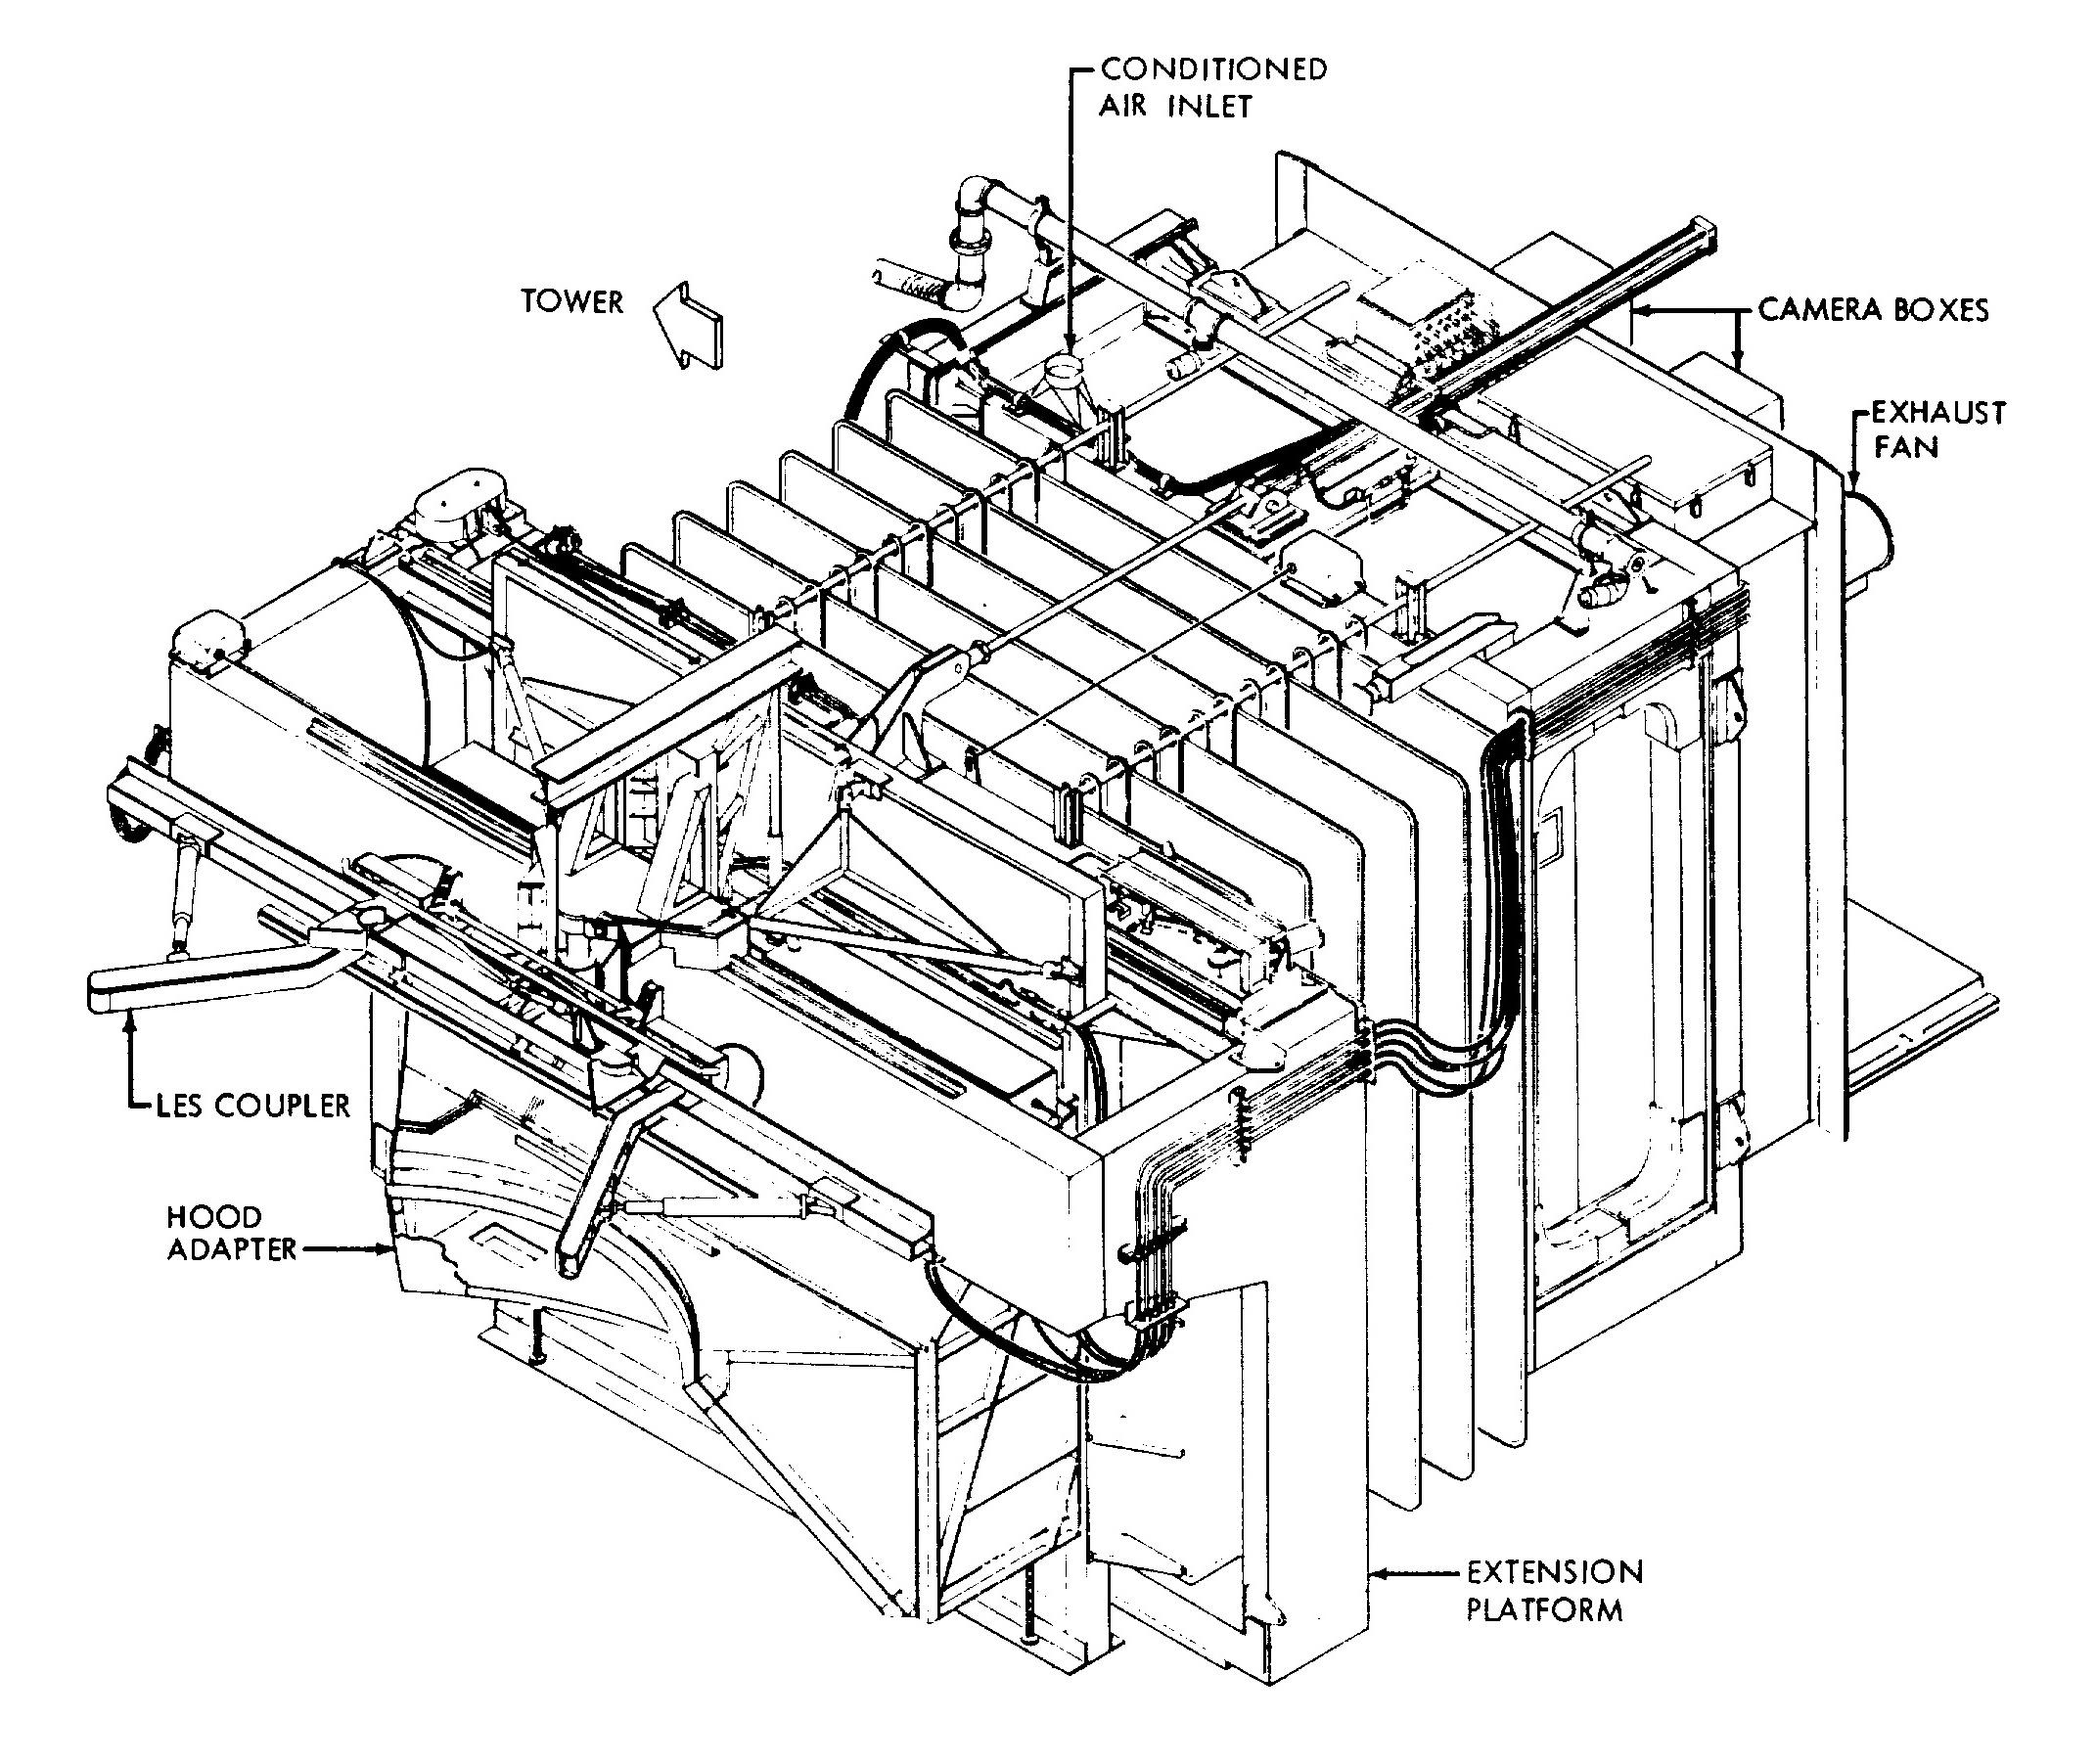 Acura Vigor Distributor Wiring Diagram. Acura. Auto Wiring